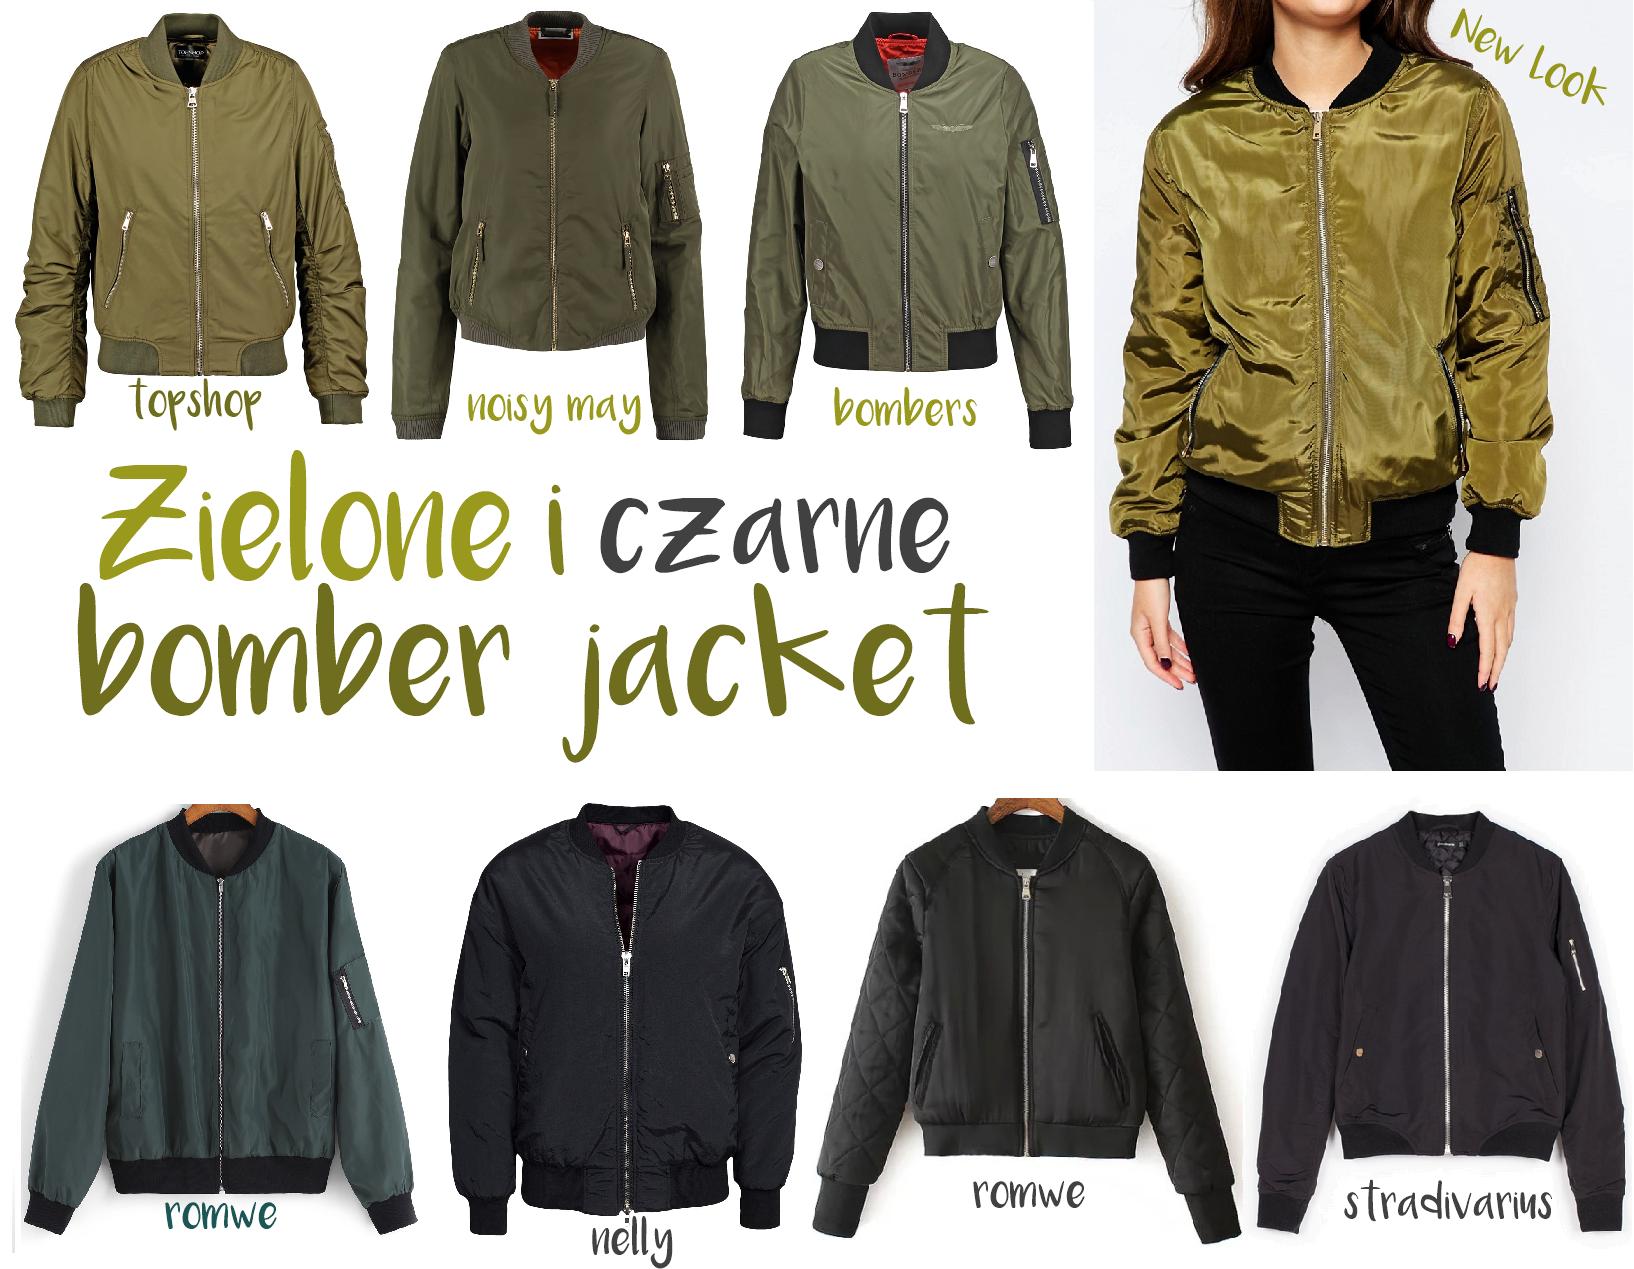 gdzie kupić bomber jacket i jak nosić